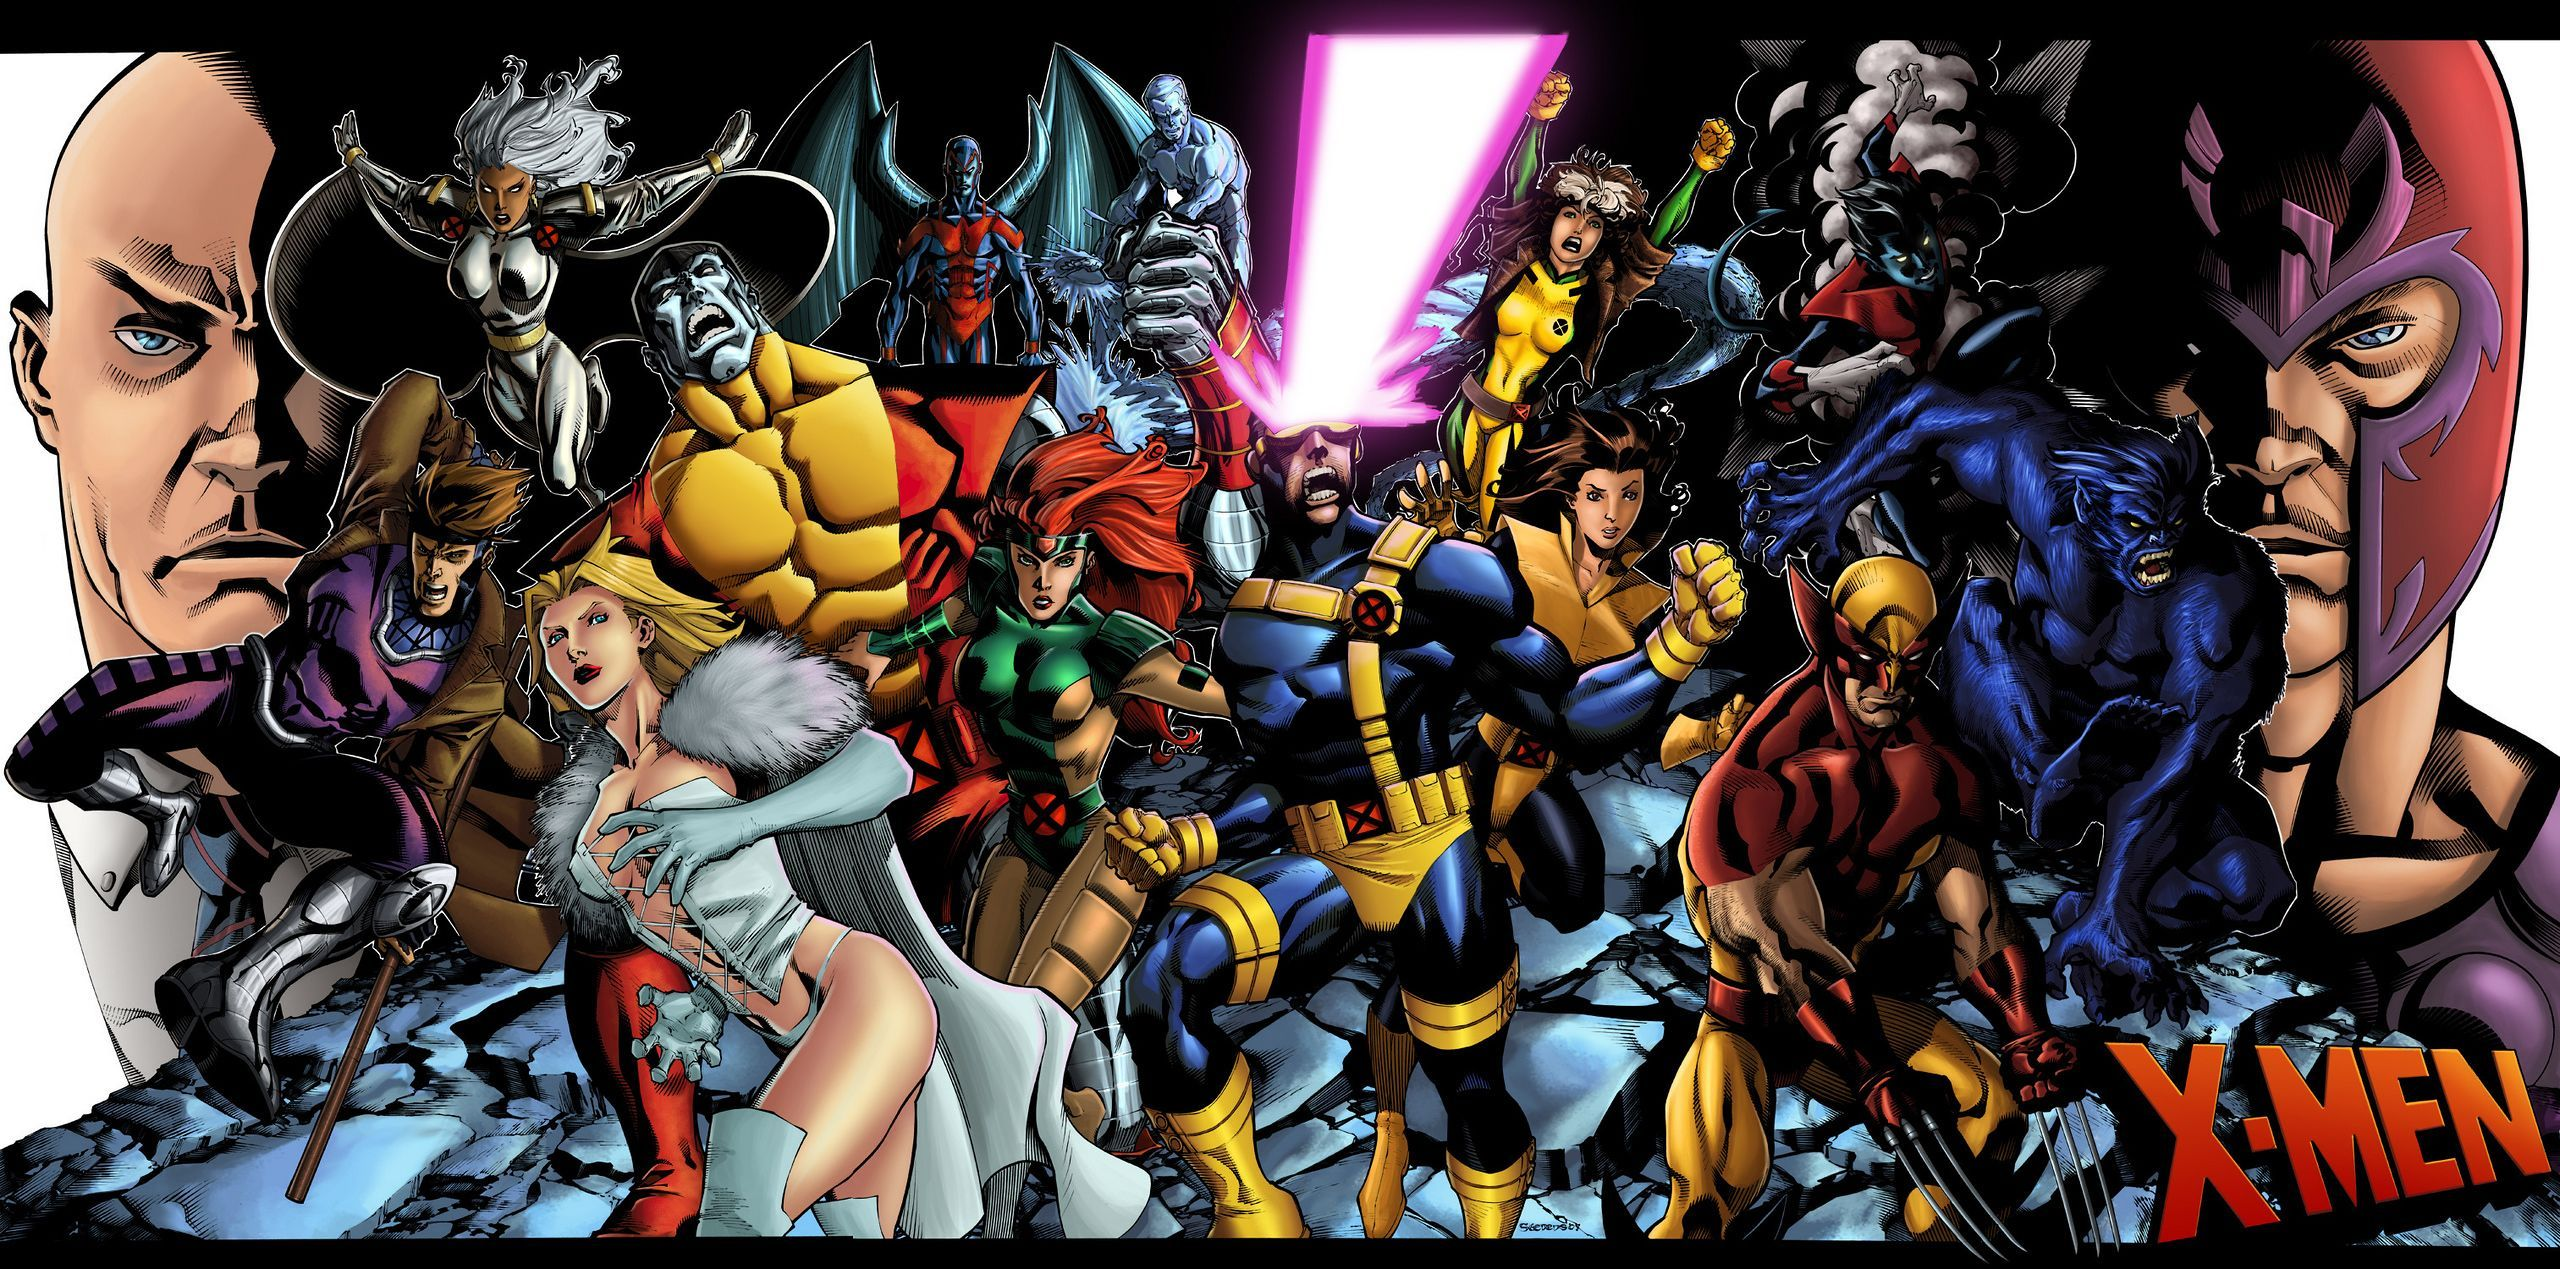 The X Men Comics Timeline A Summary Of Major Events Leading To Apocalypse 808418 Jpg 2560 1269 Marvel Wallpaper Marvel Comics Wallpaper Epic Art